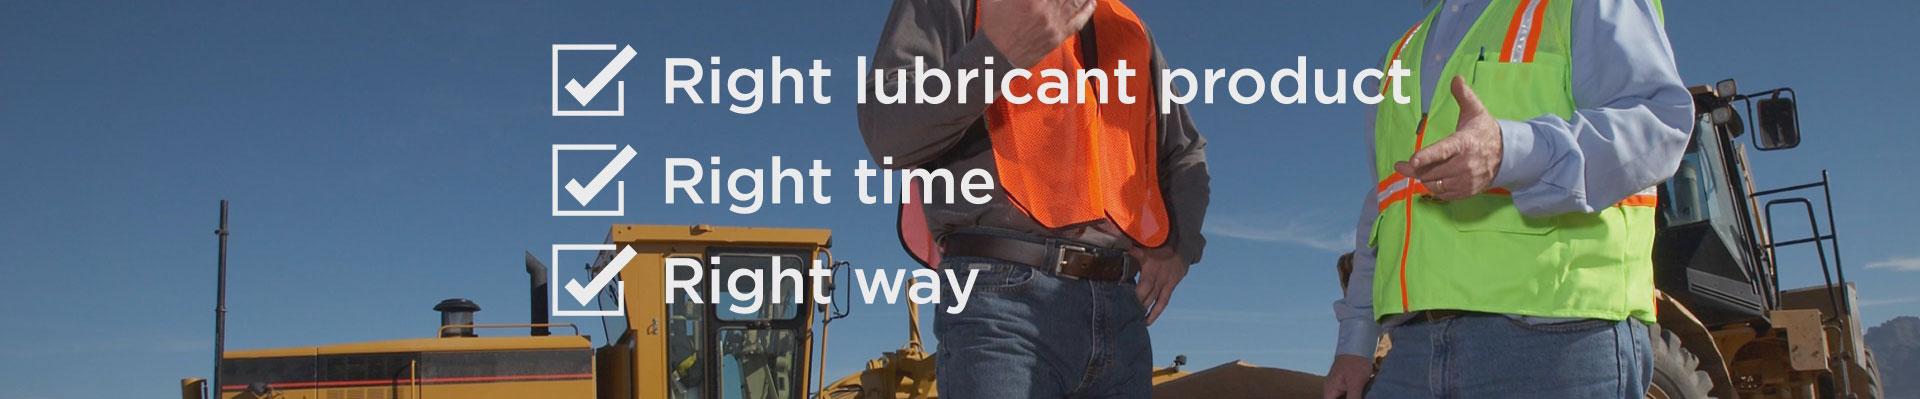 lubricants-sutton-system-sales-banner